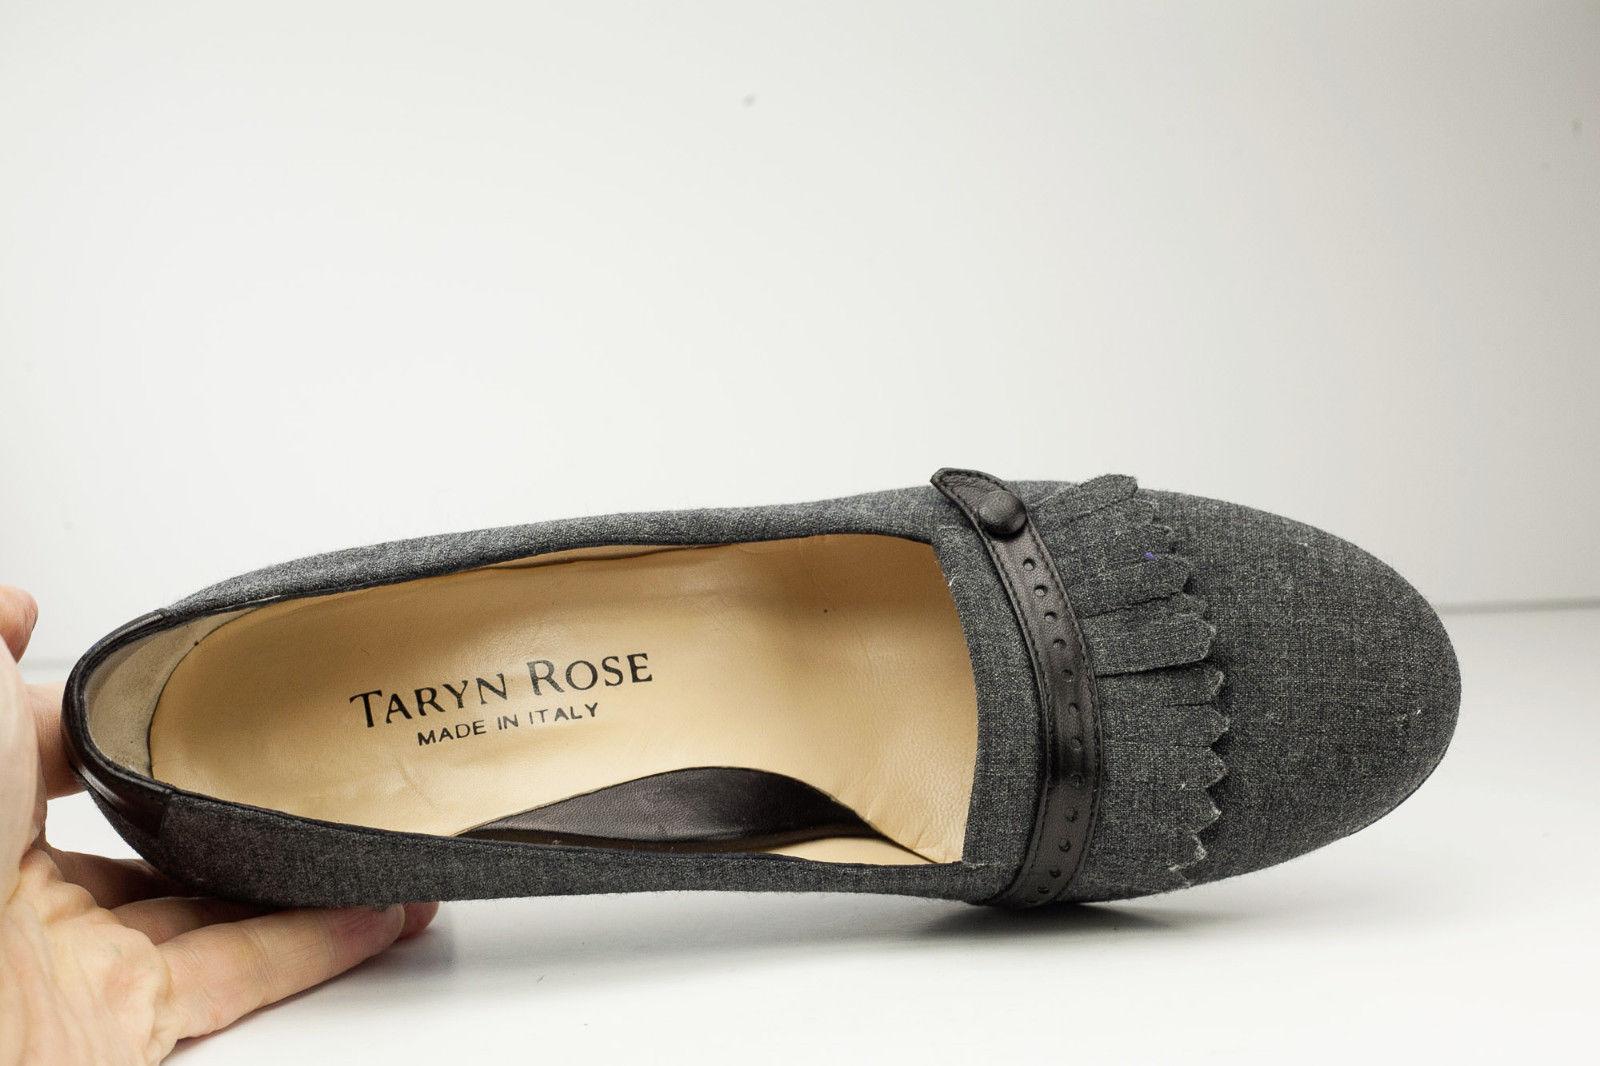 c265898337e5 Taryn Rose 9 Gray Pumps Women S Shoes Eu And 50 Similar Items